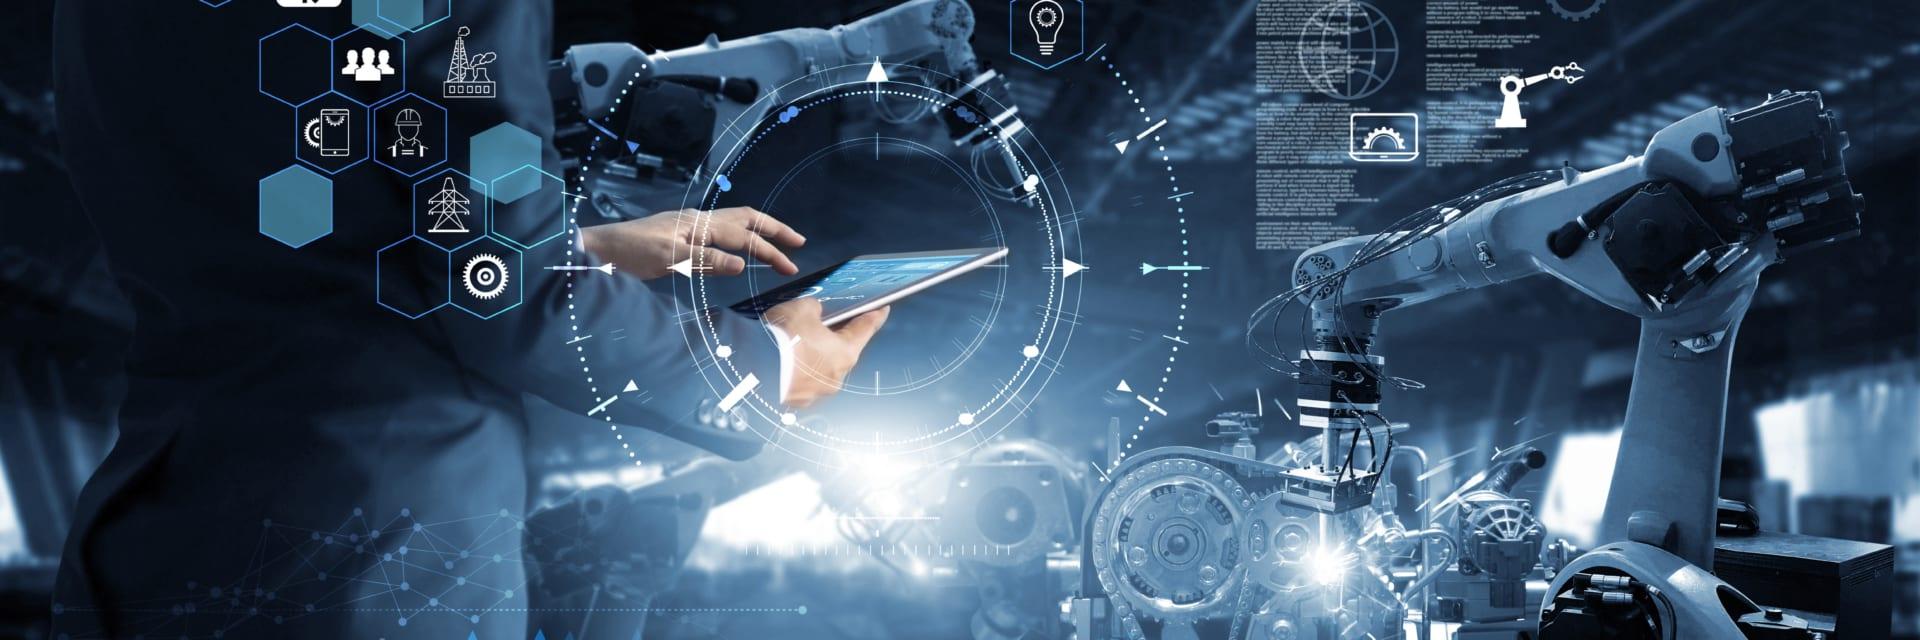 Robotic Process Automation (RPA) Image